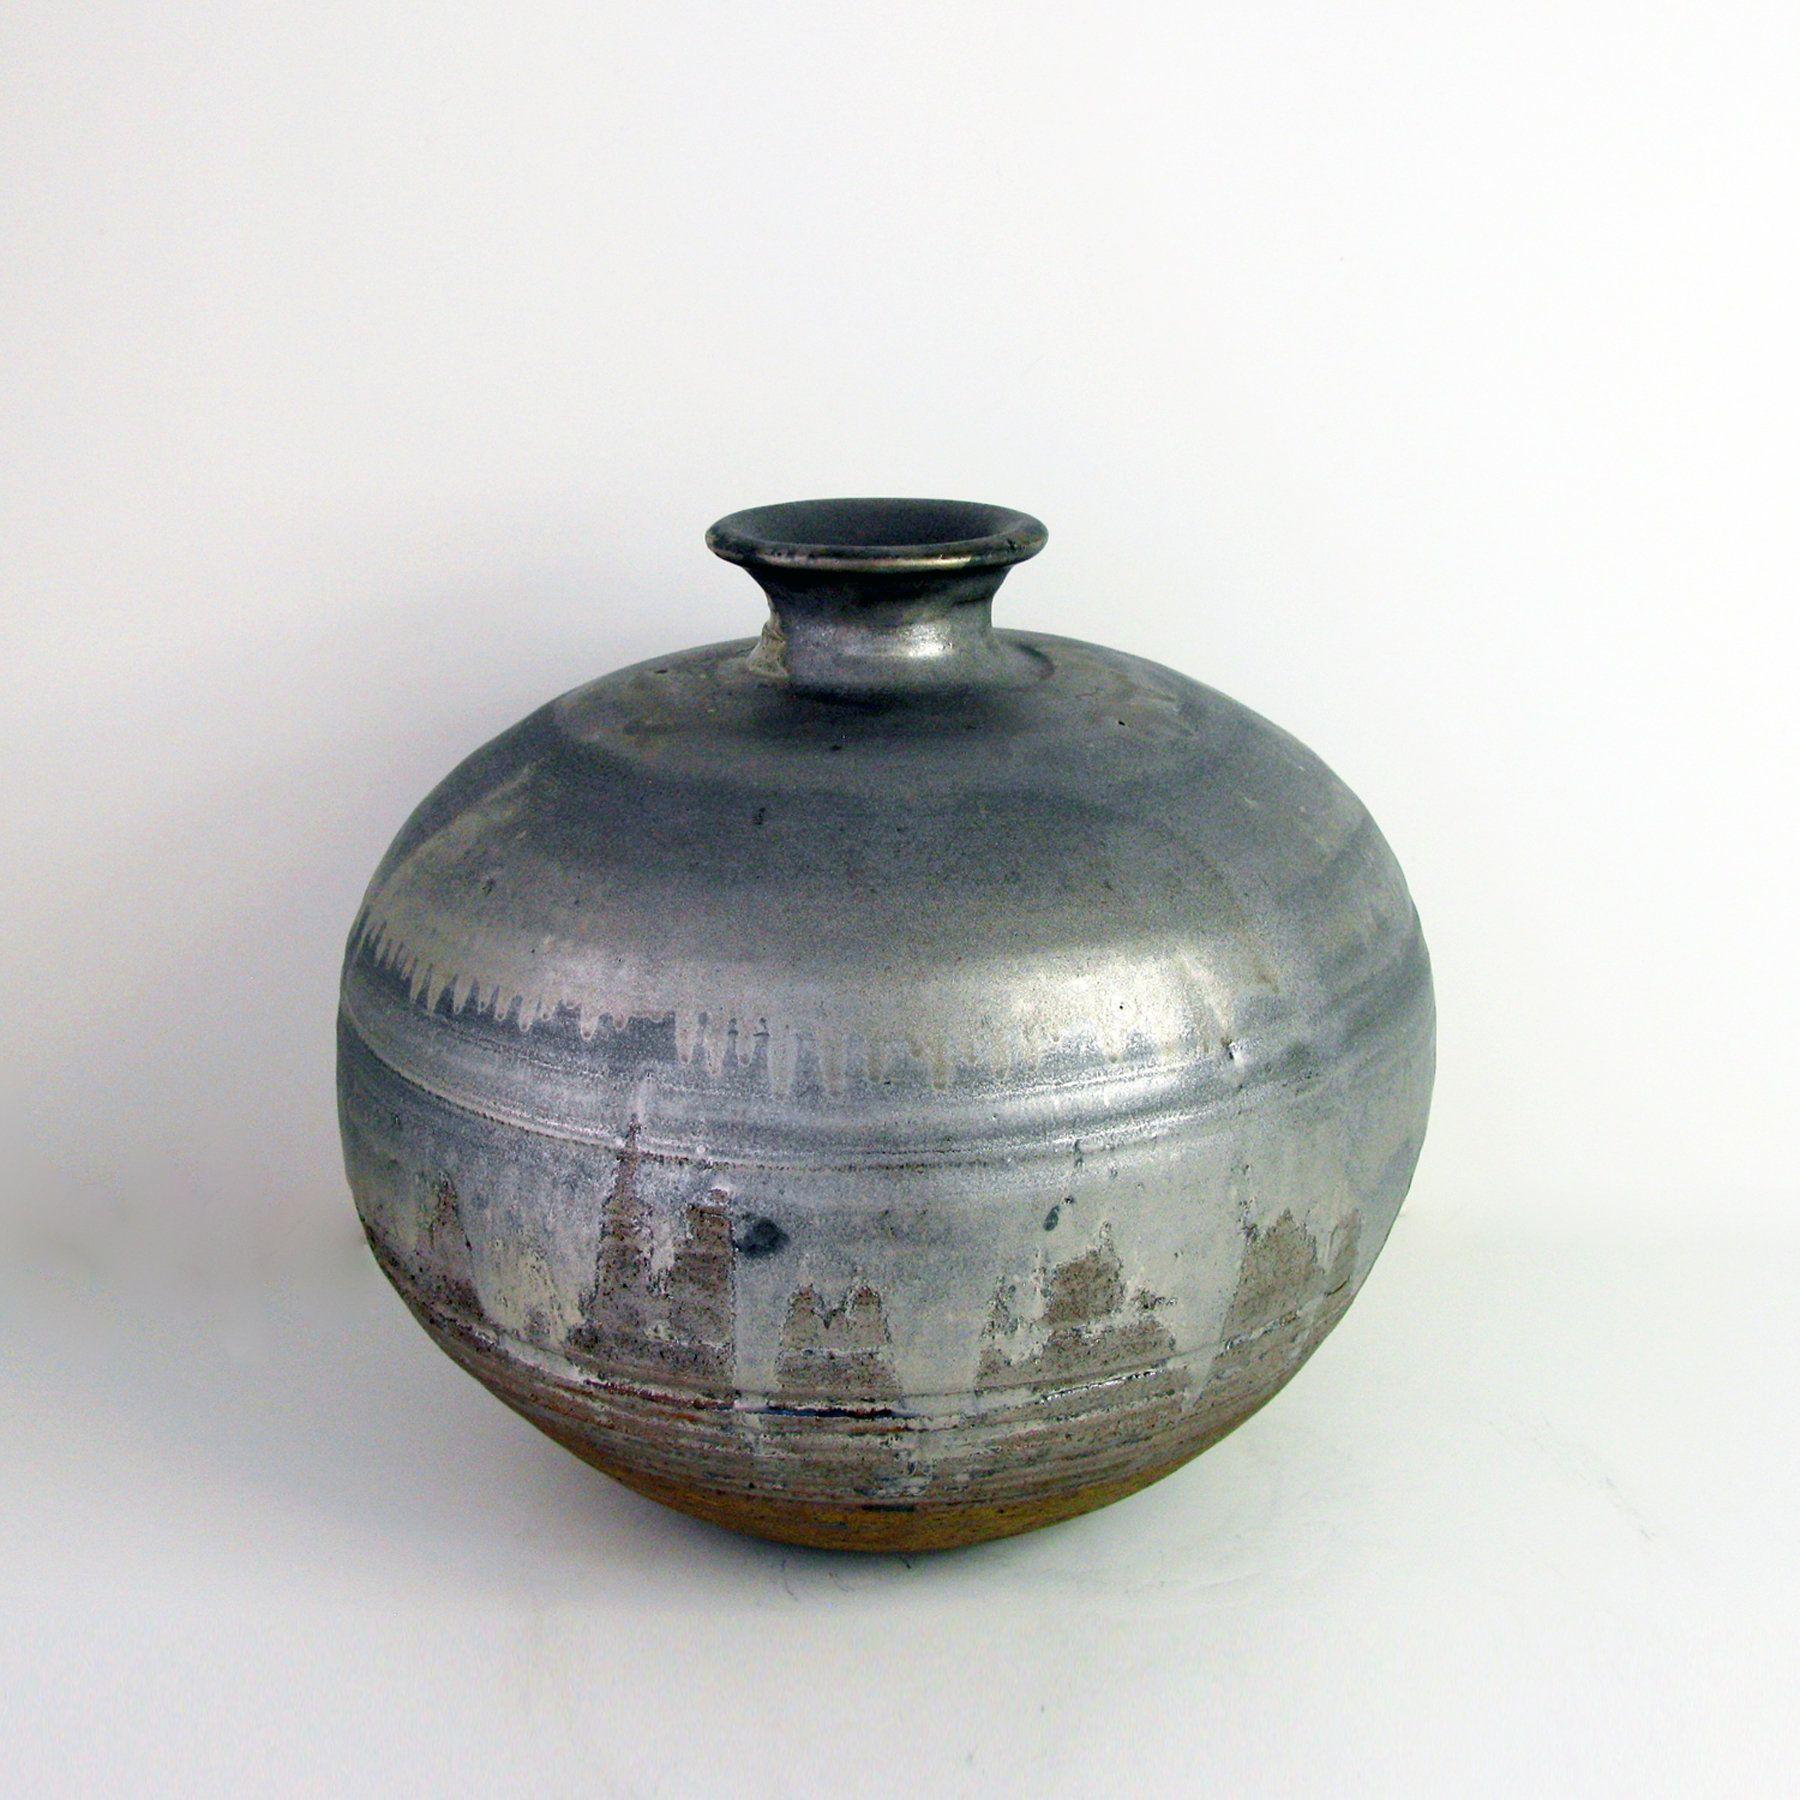 Virga Collection Vase II by Tatiana Hunter